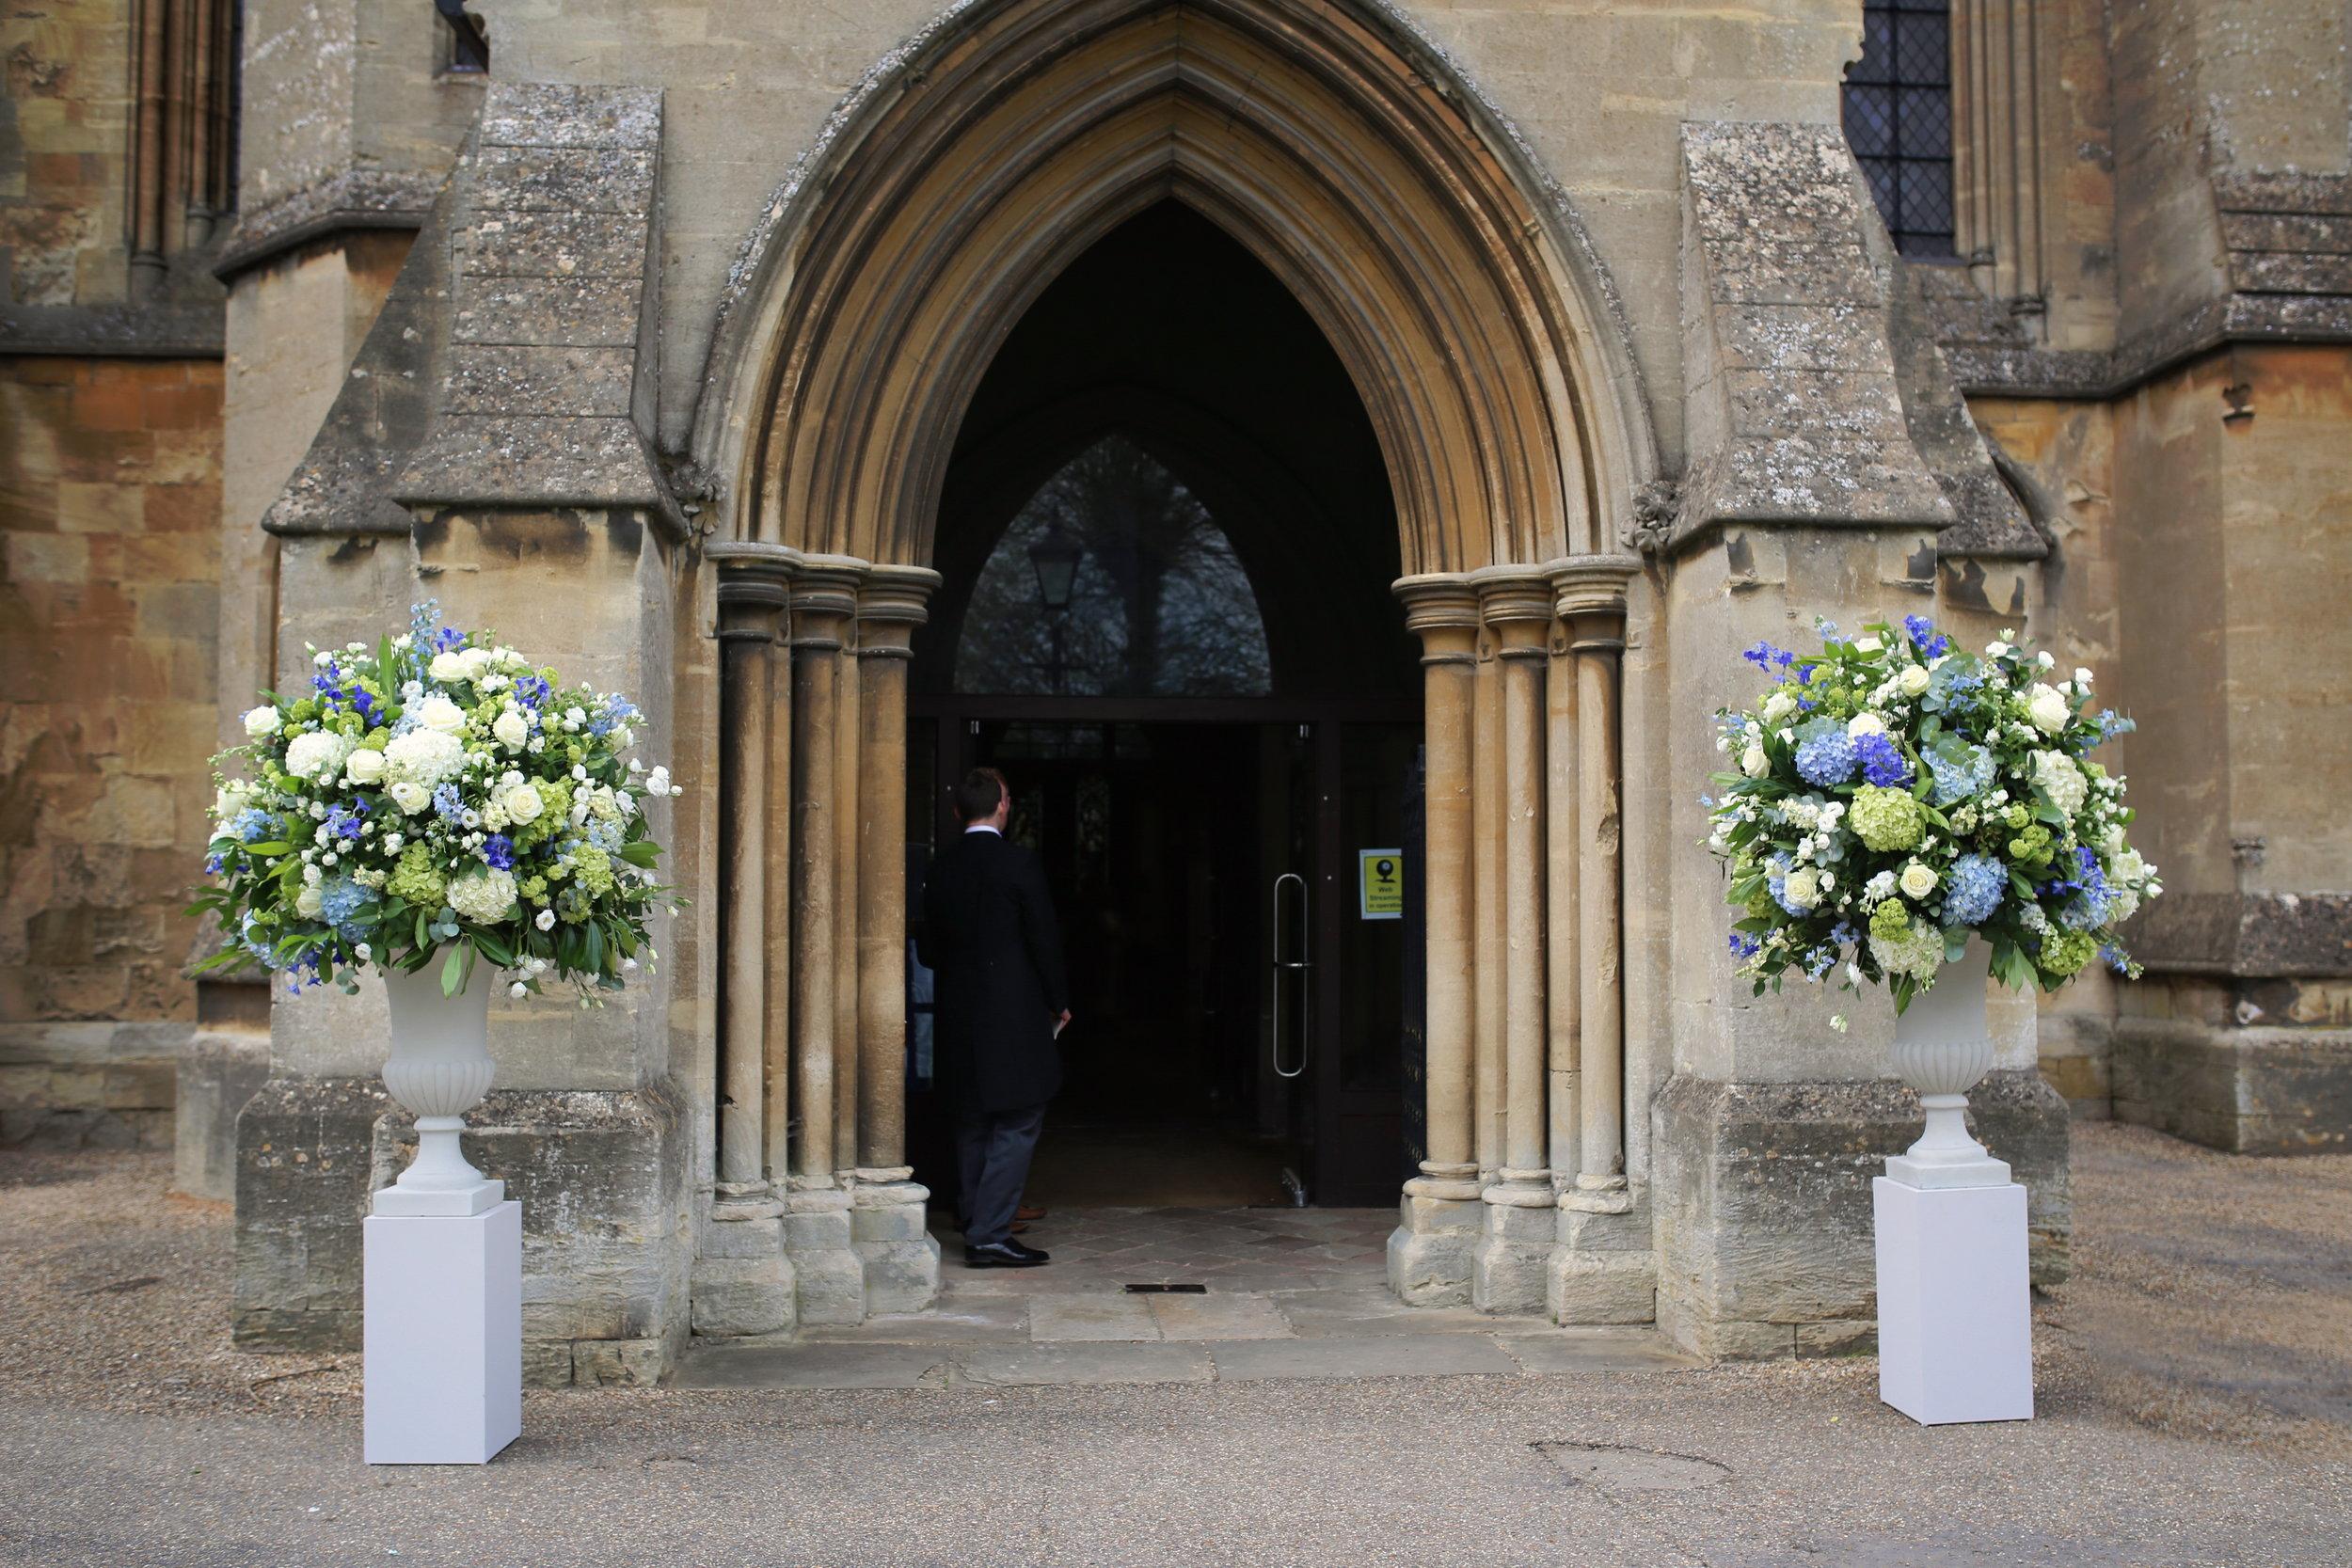 MIRIAM_FAITH_WEDDING_FLOWERS_CEREMONY_URN_CHURCH_PEDESTAL_BLUE_WHITE_GREEN.JPG